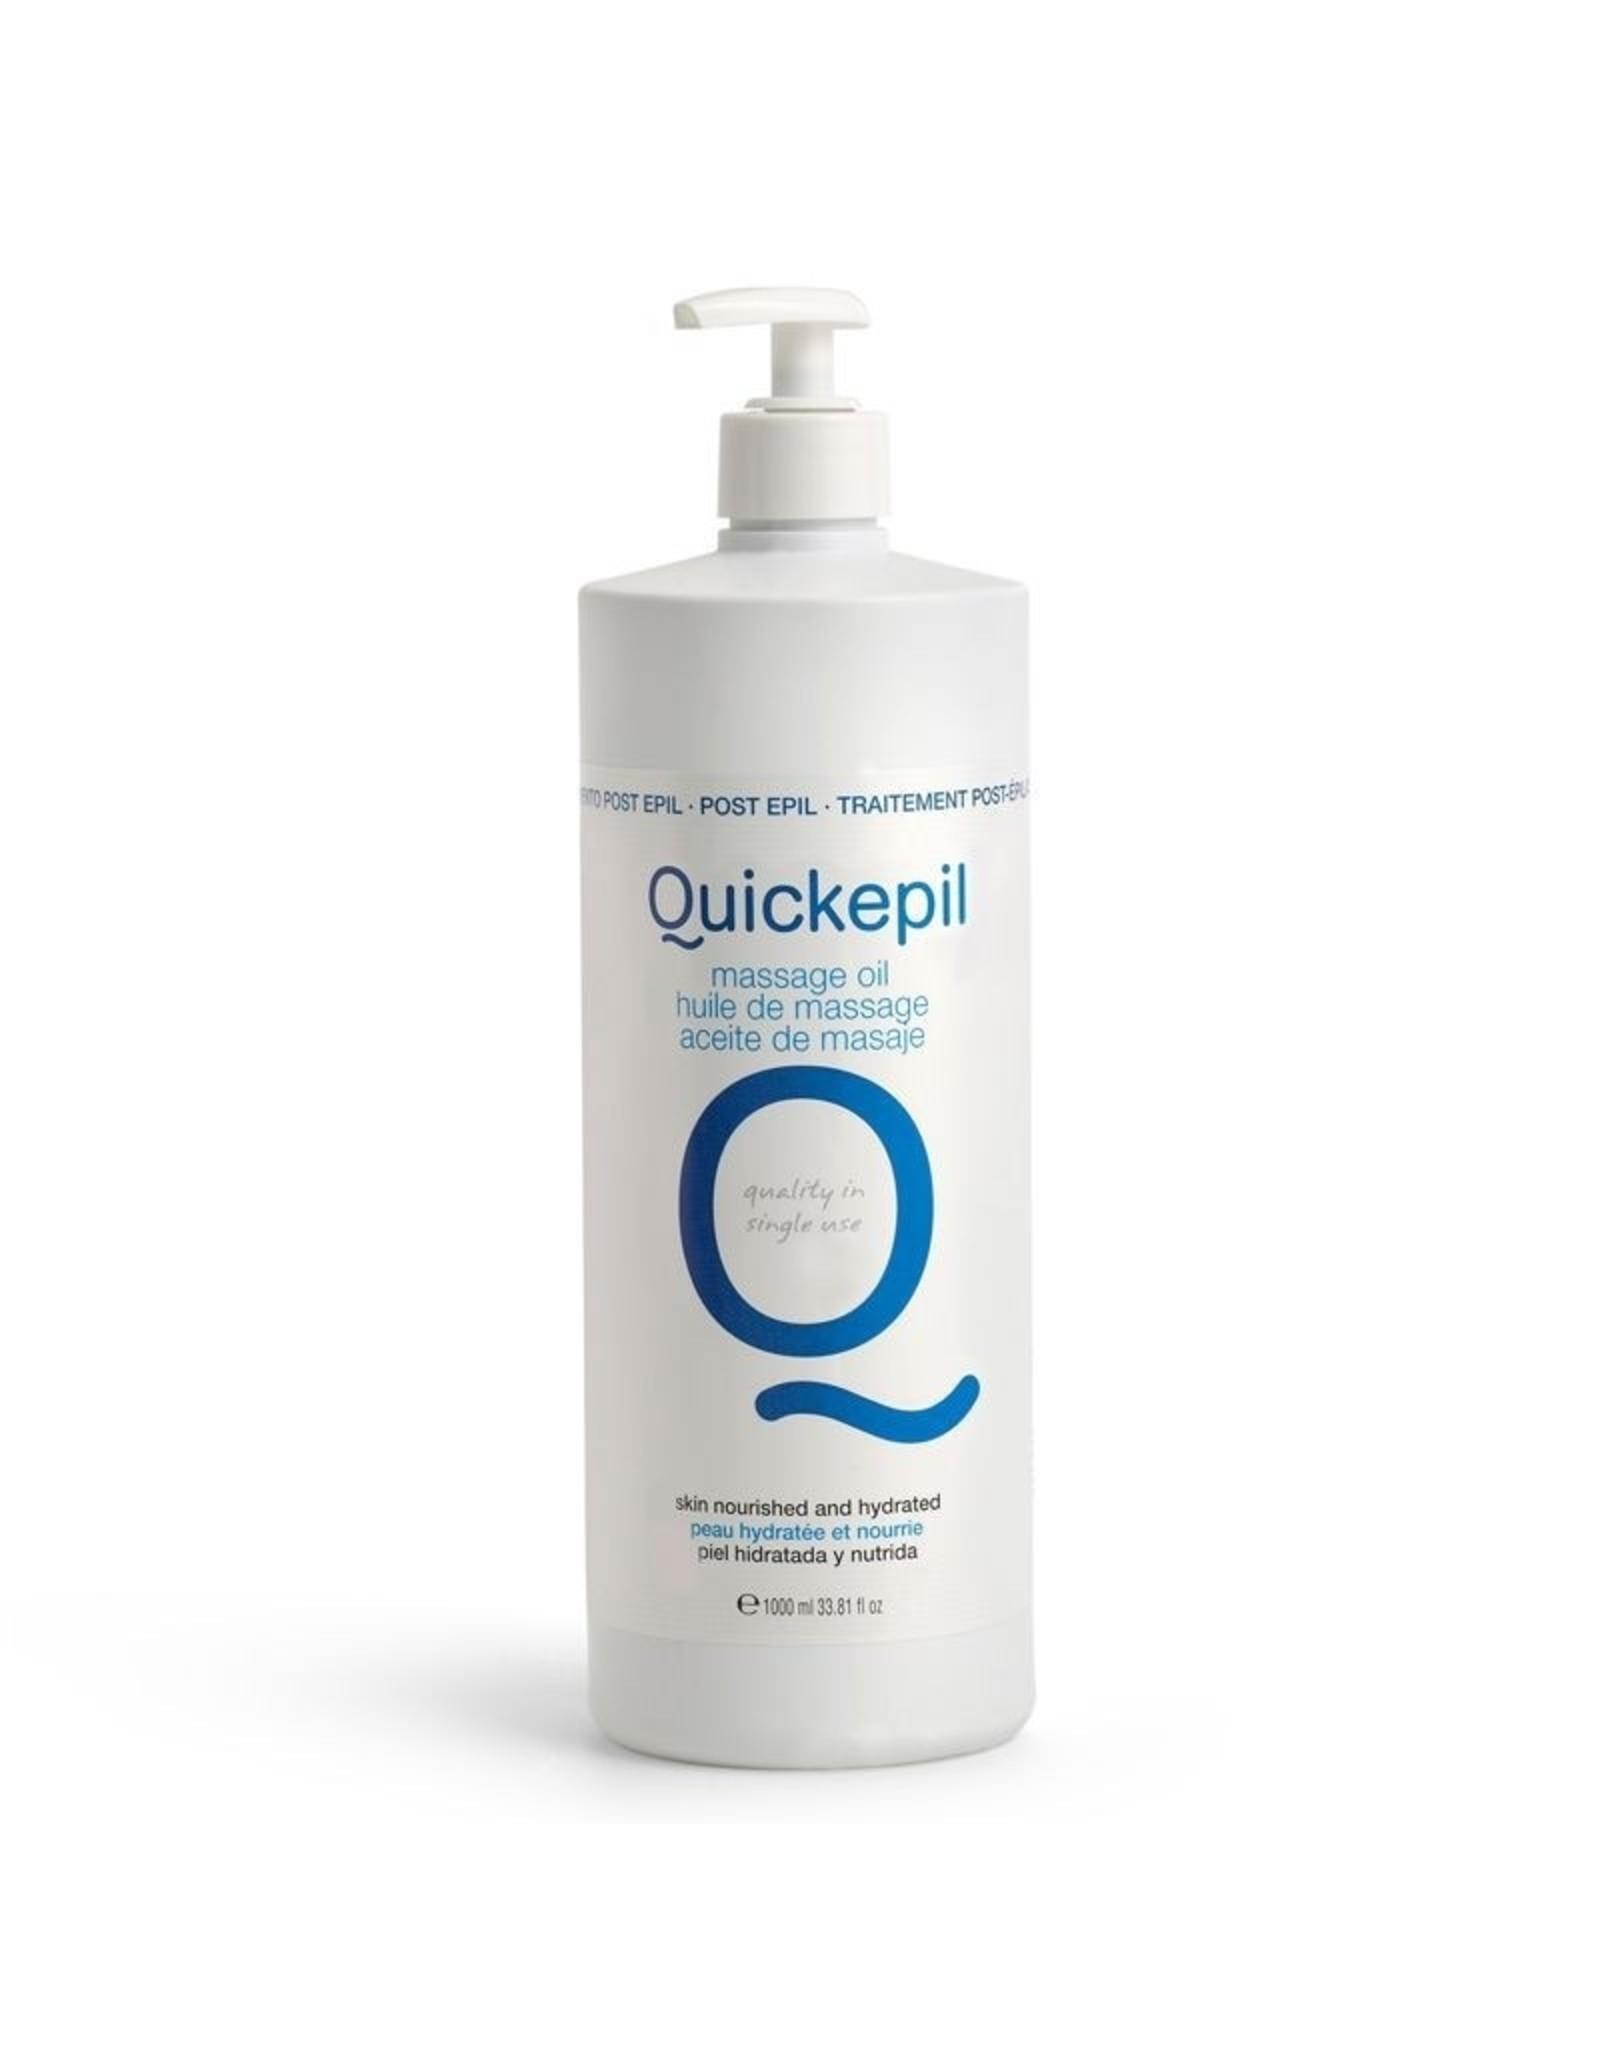 QUICKEPIL Wax Massage Olie Voor Na Ontharing 1000ml.